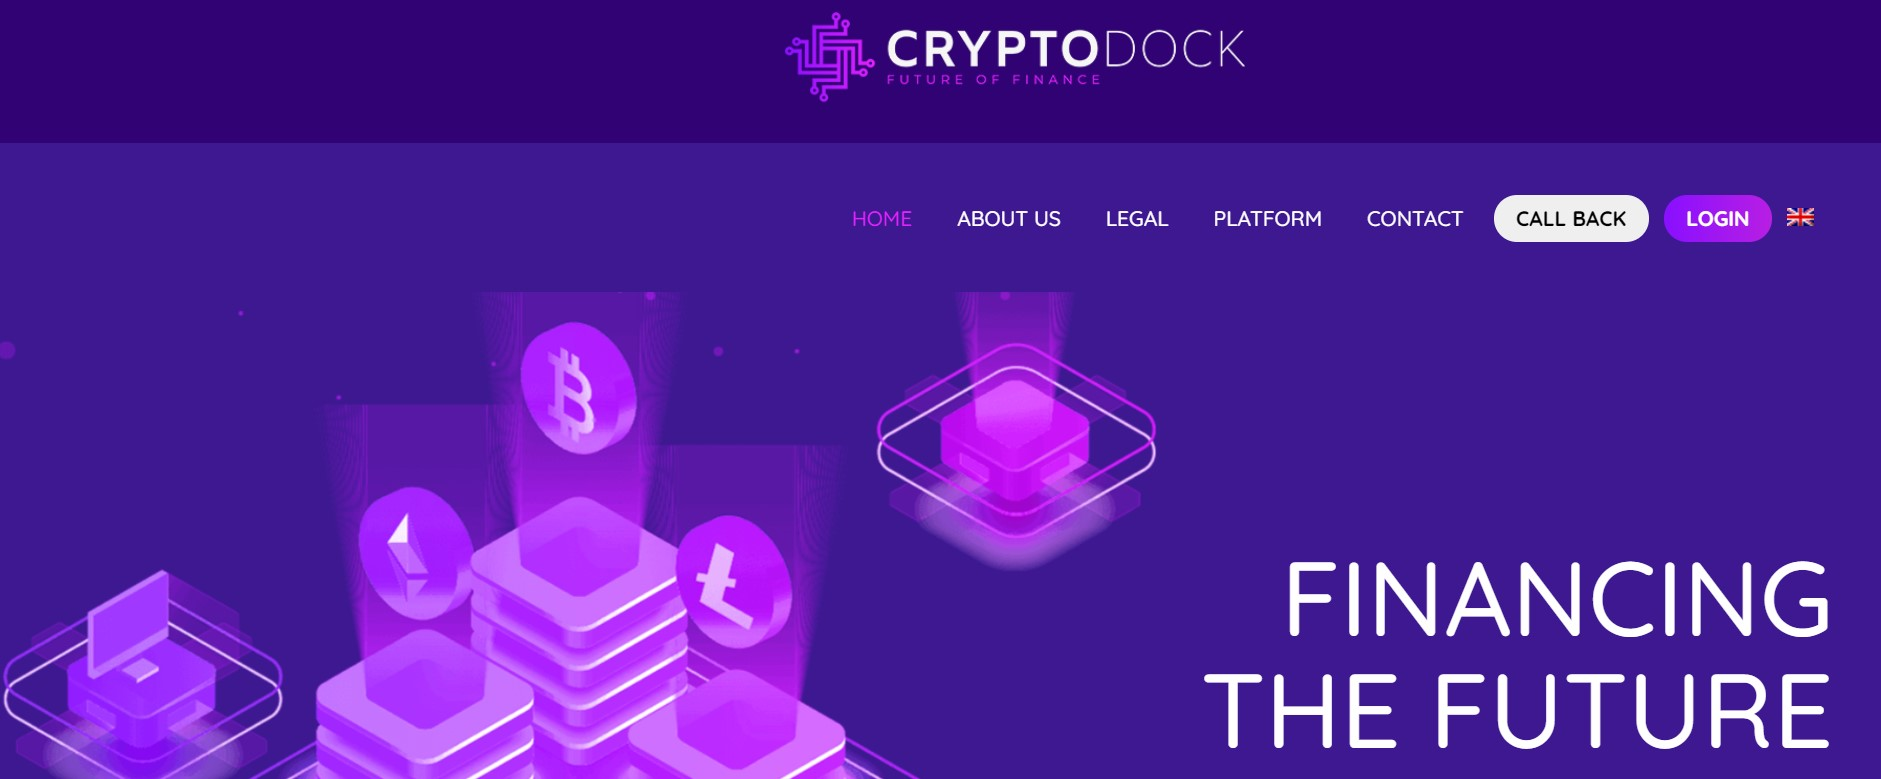 Crypto-Dock website